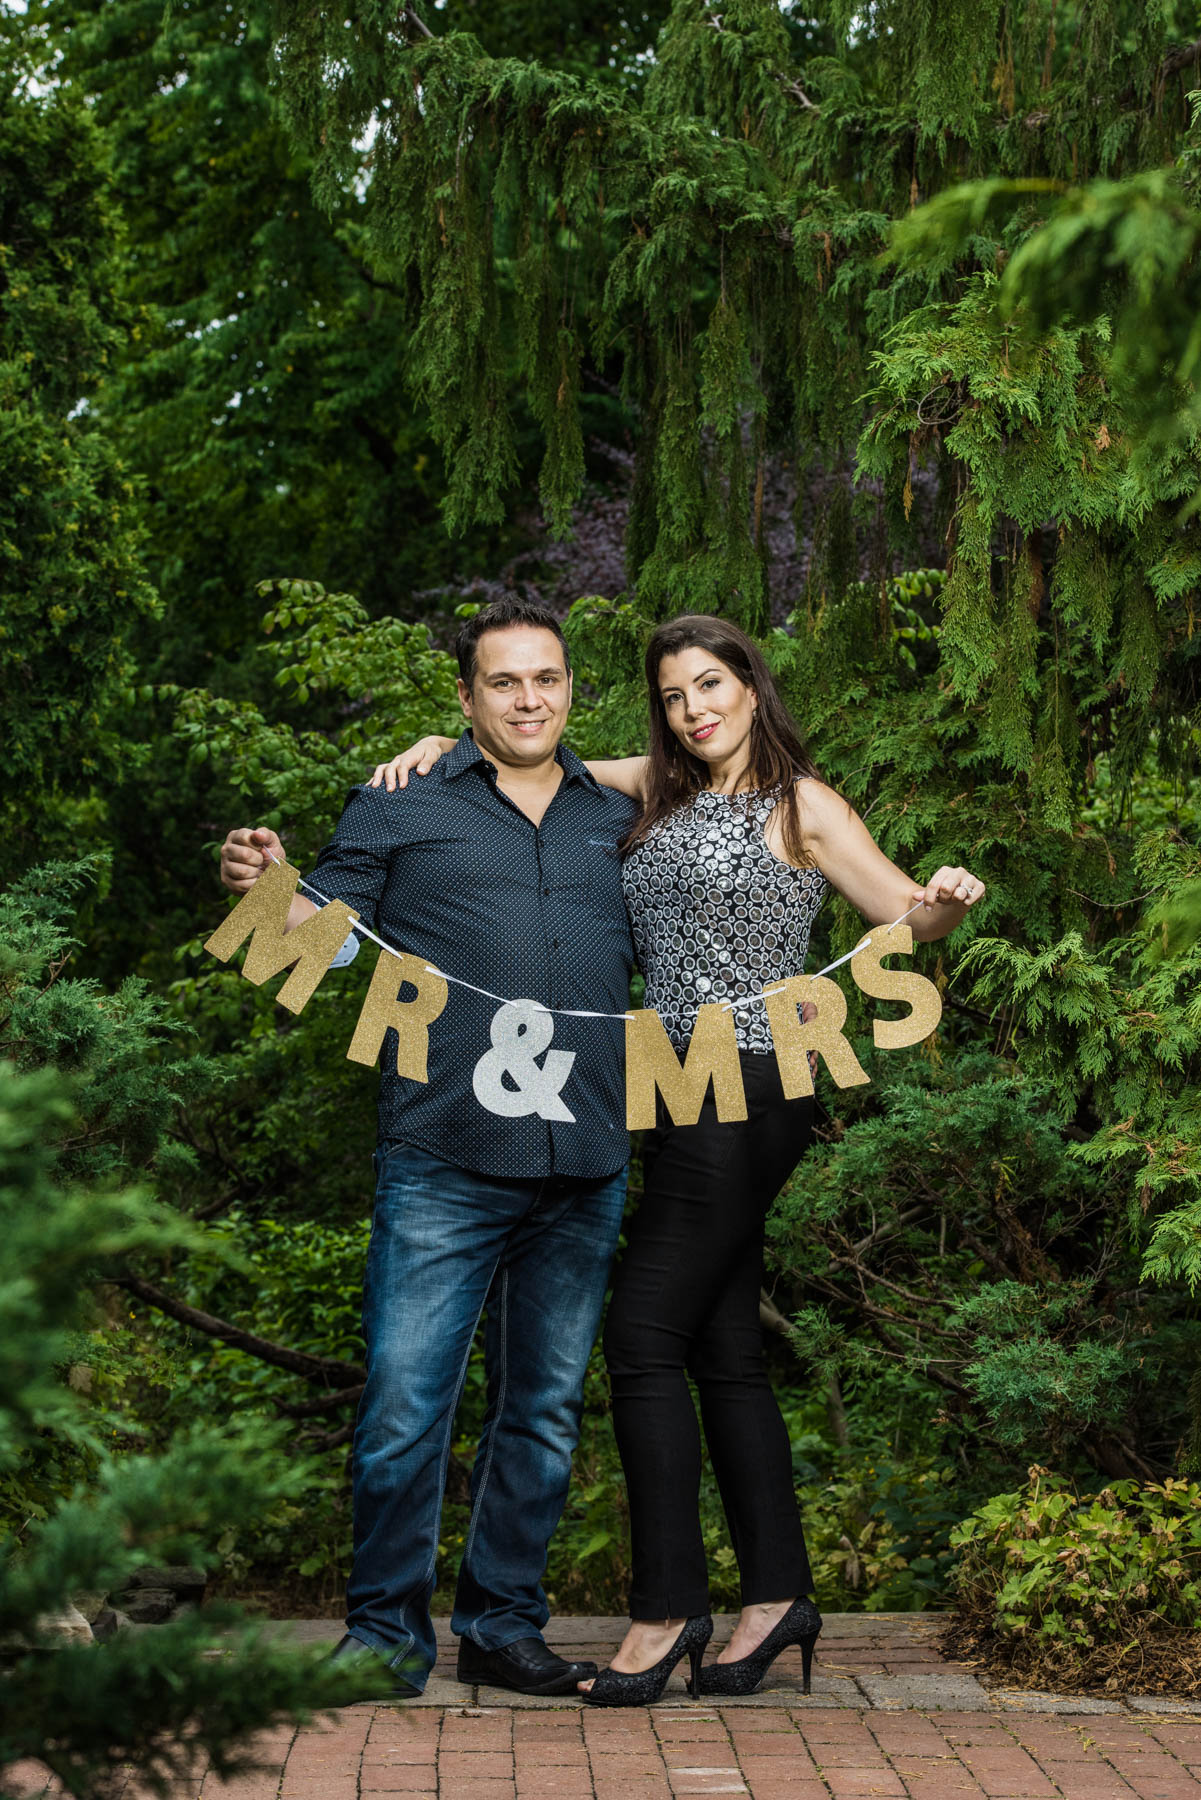 027 - Engagement JJ Alexander Muir Memorial Gardens